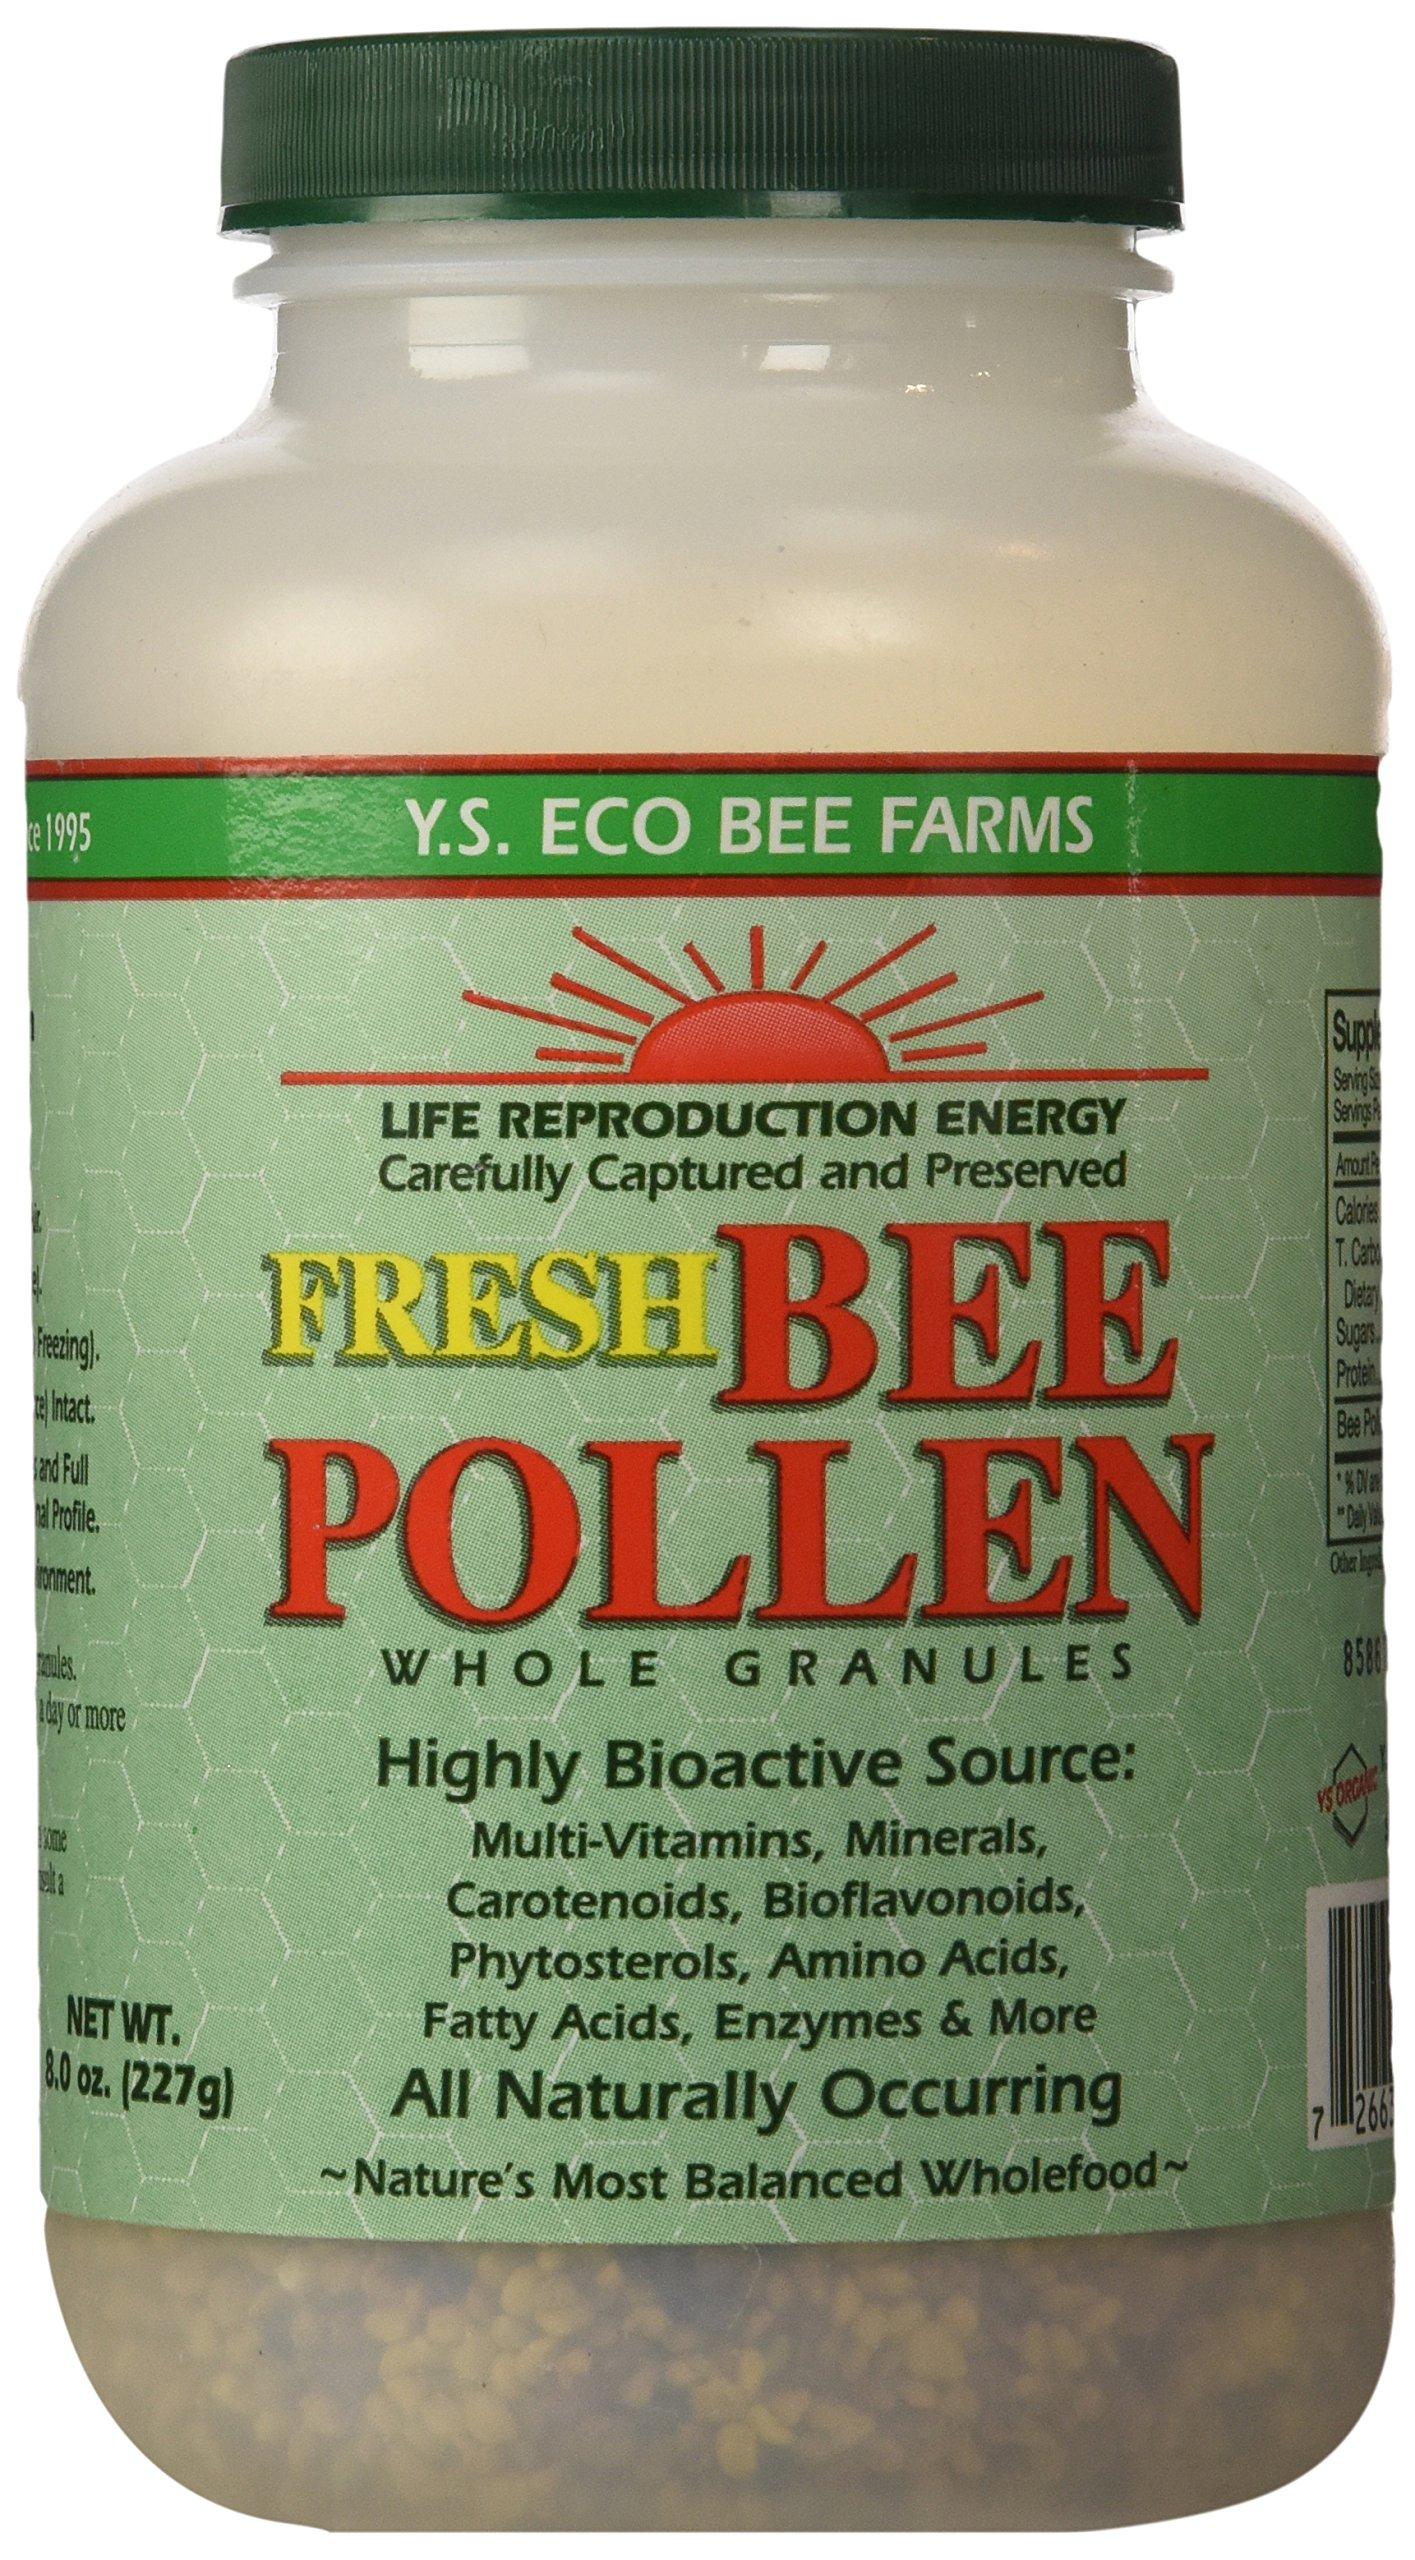 Y.S. Organics Fresh Bee Pollen Whole Granules, 8 Ounce